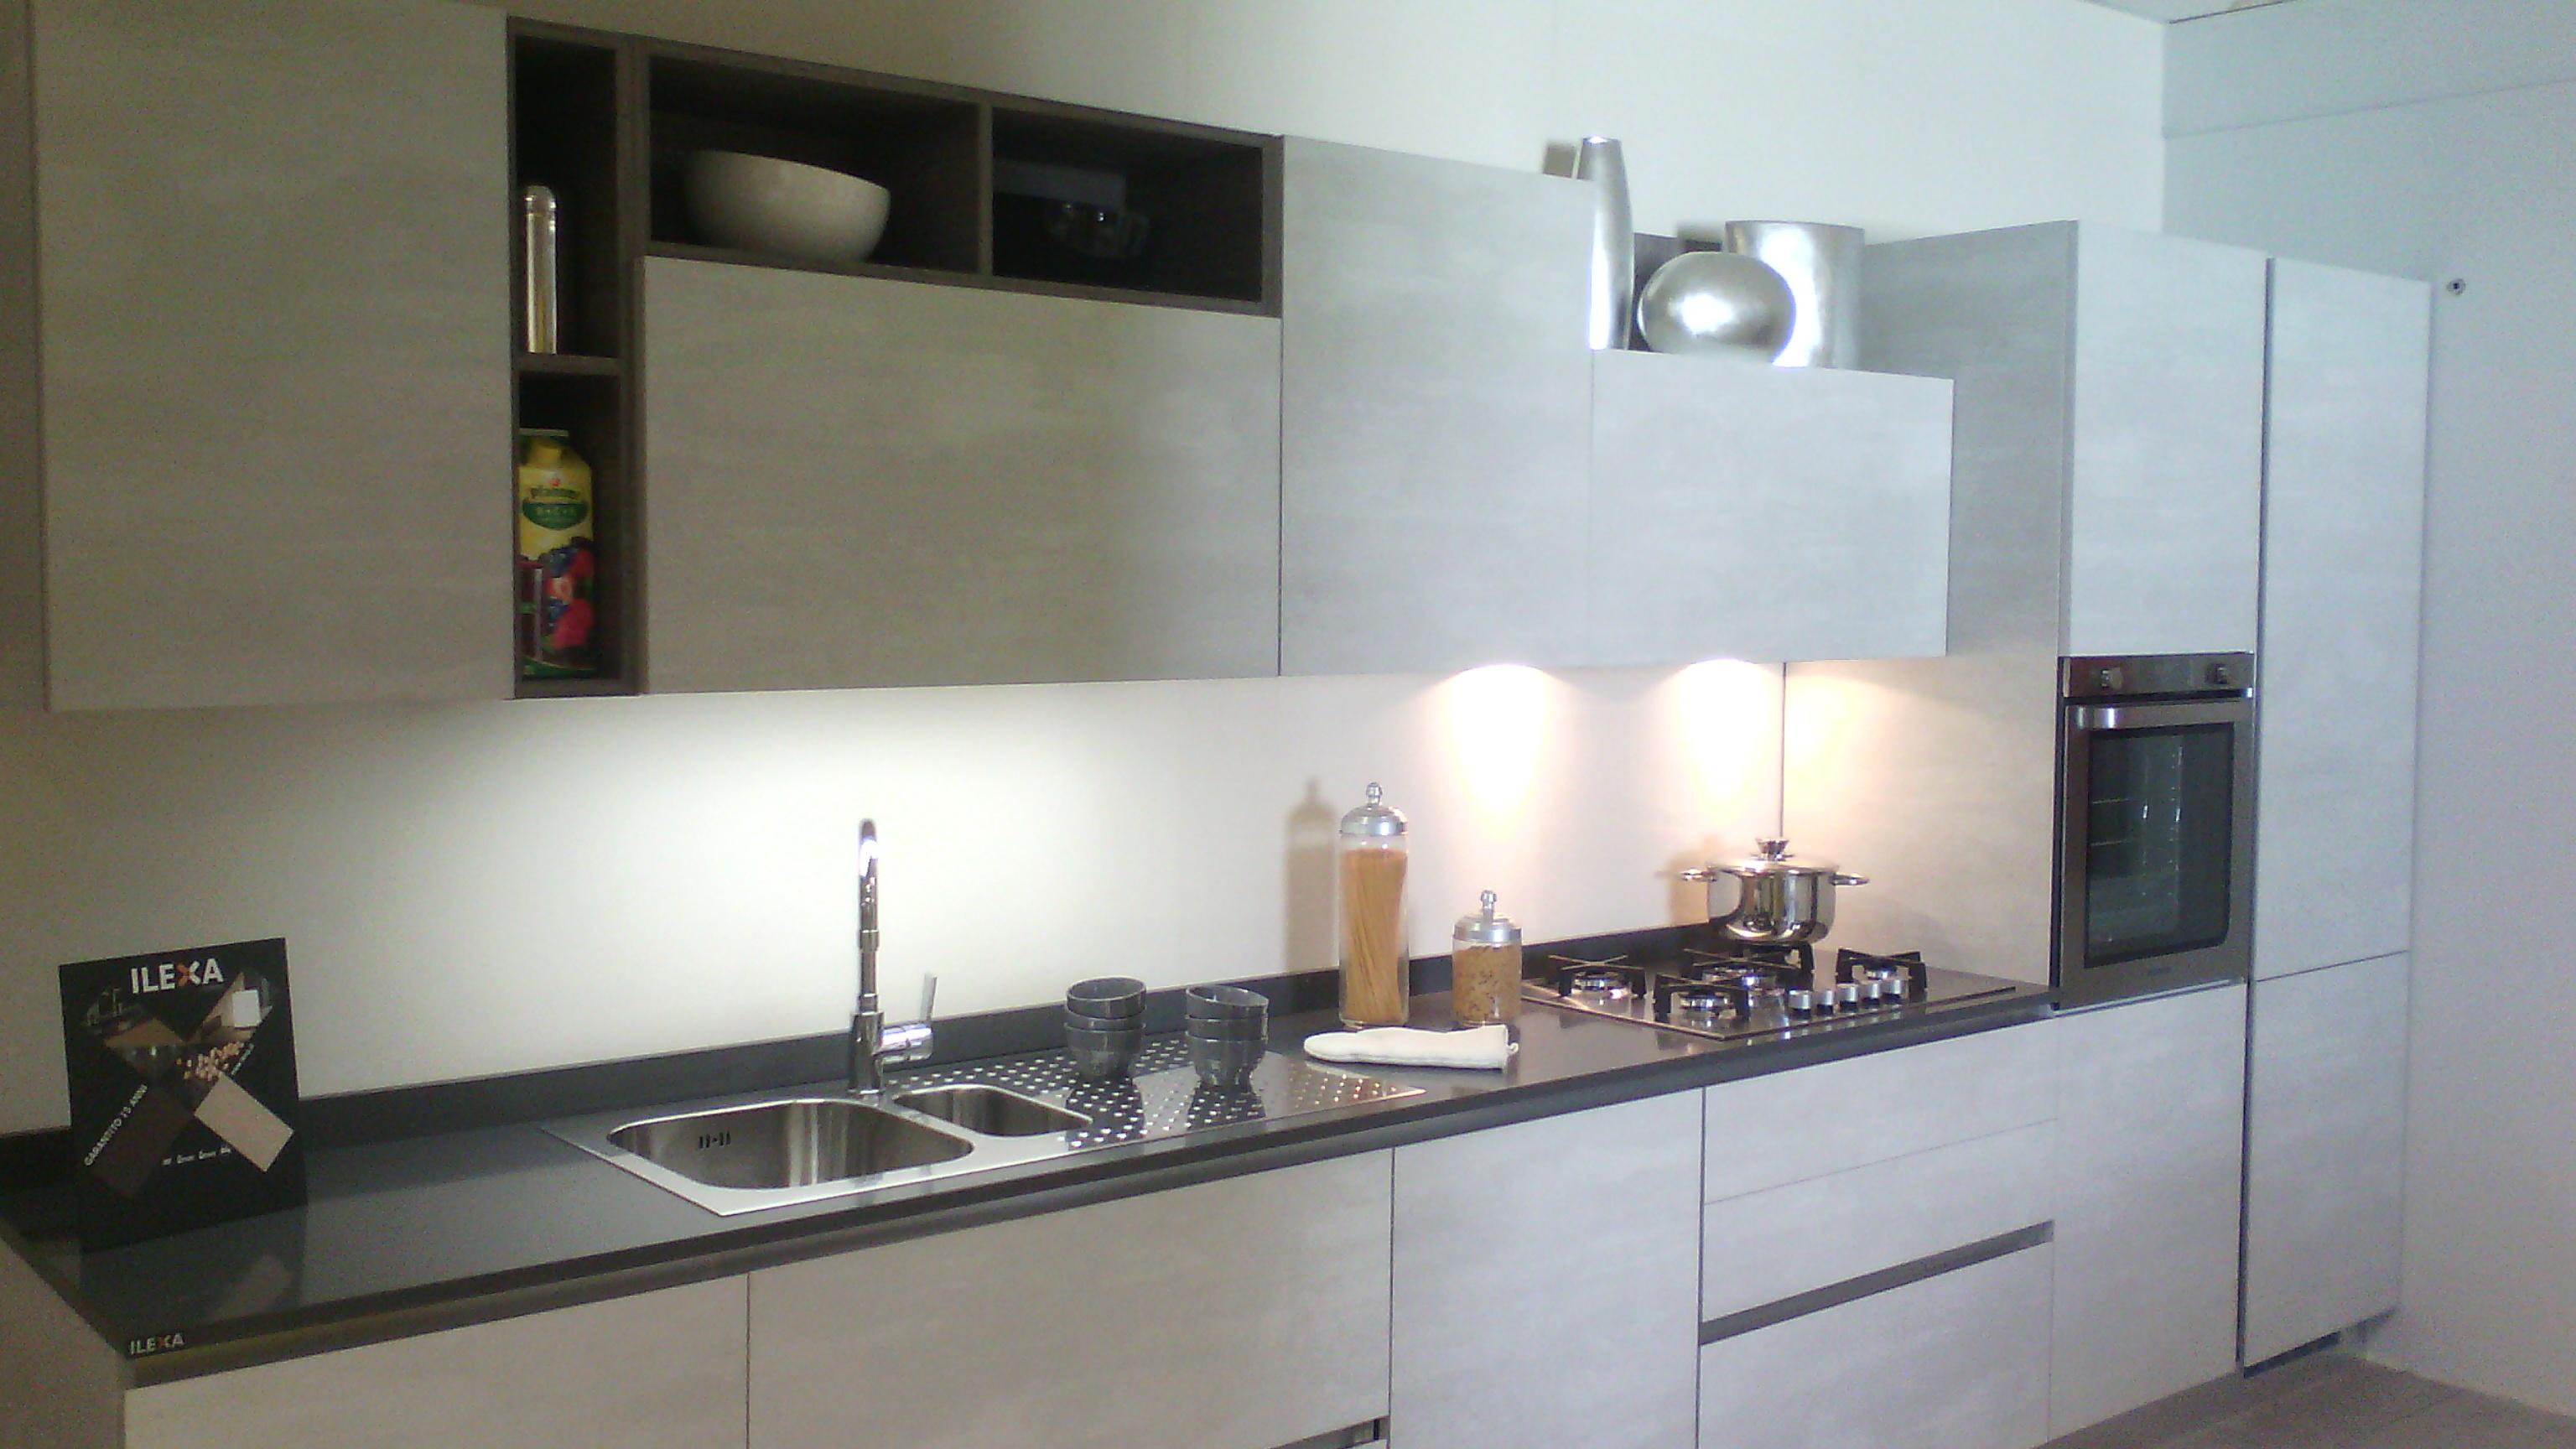 CEMENTO SPATOLATO – Outlet della Cucina